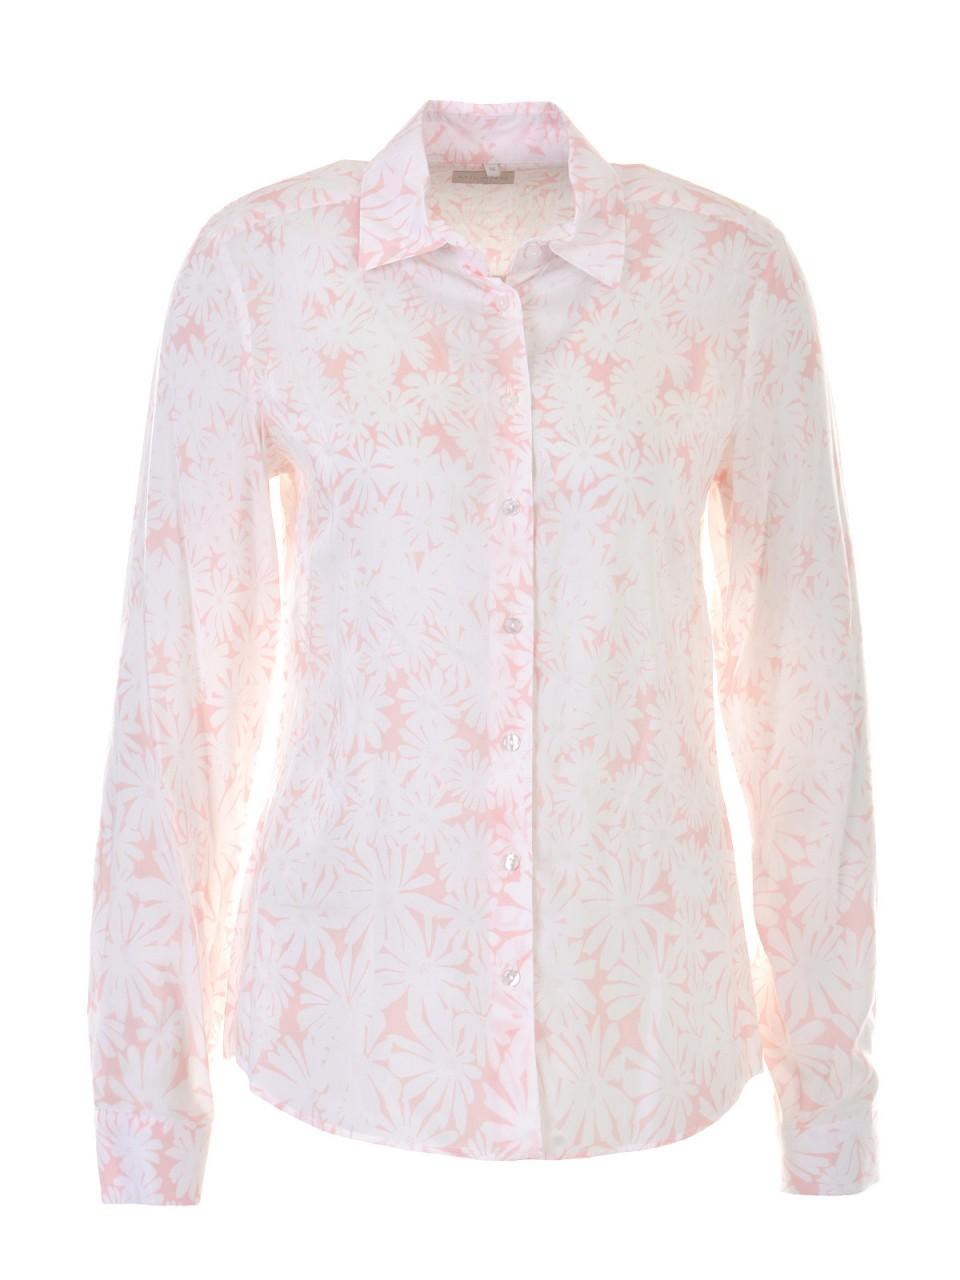 milano-italy-damen-bluse-rosa-wei-szlig-